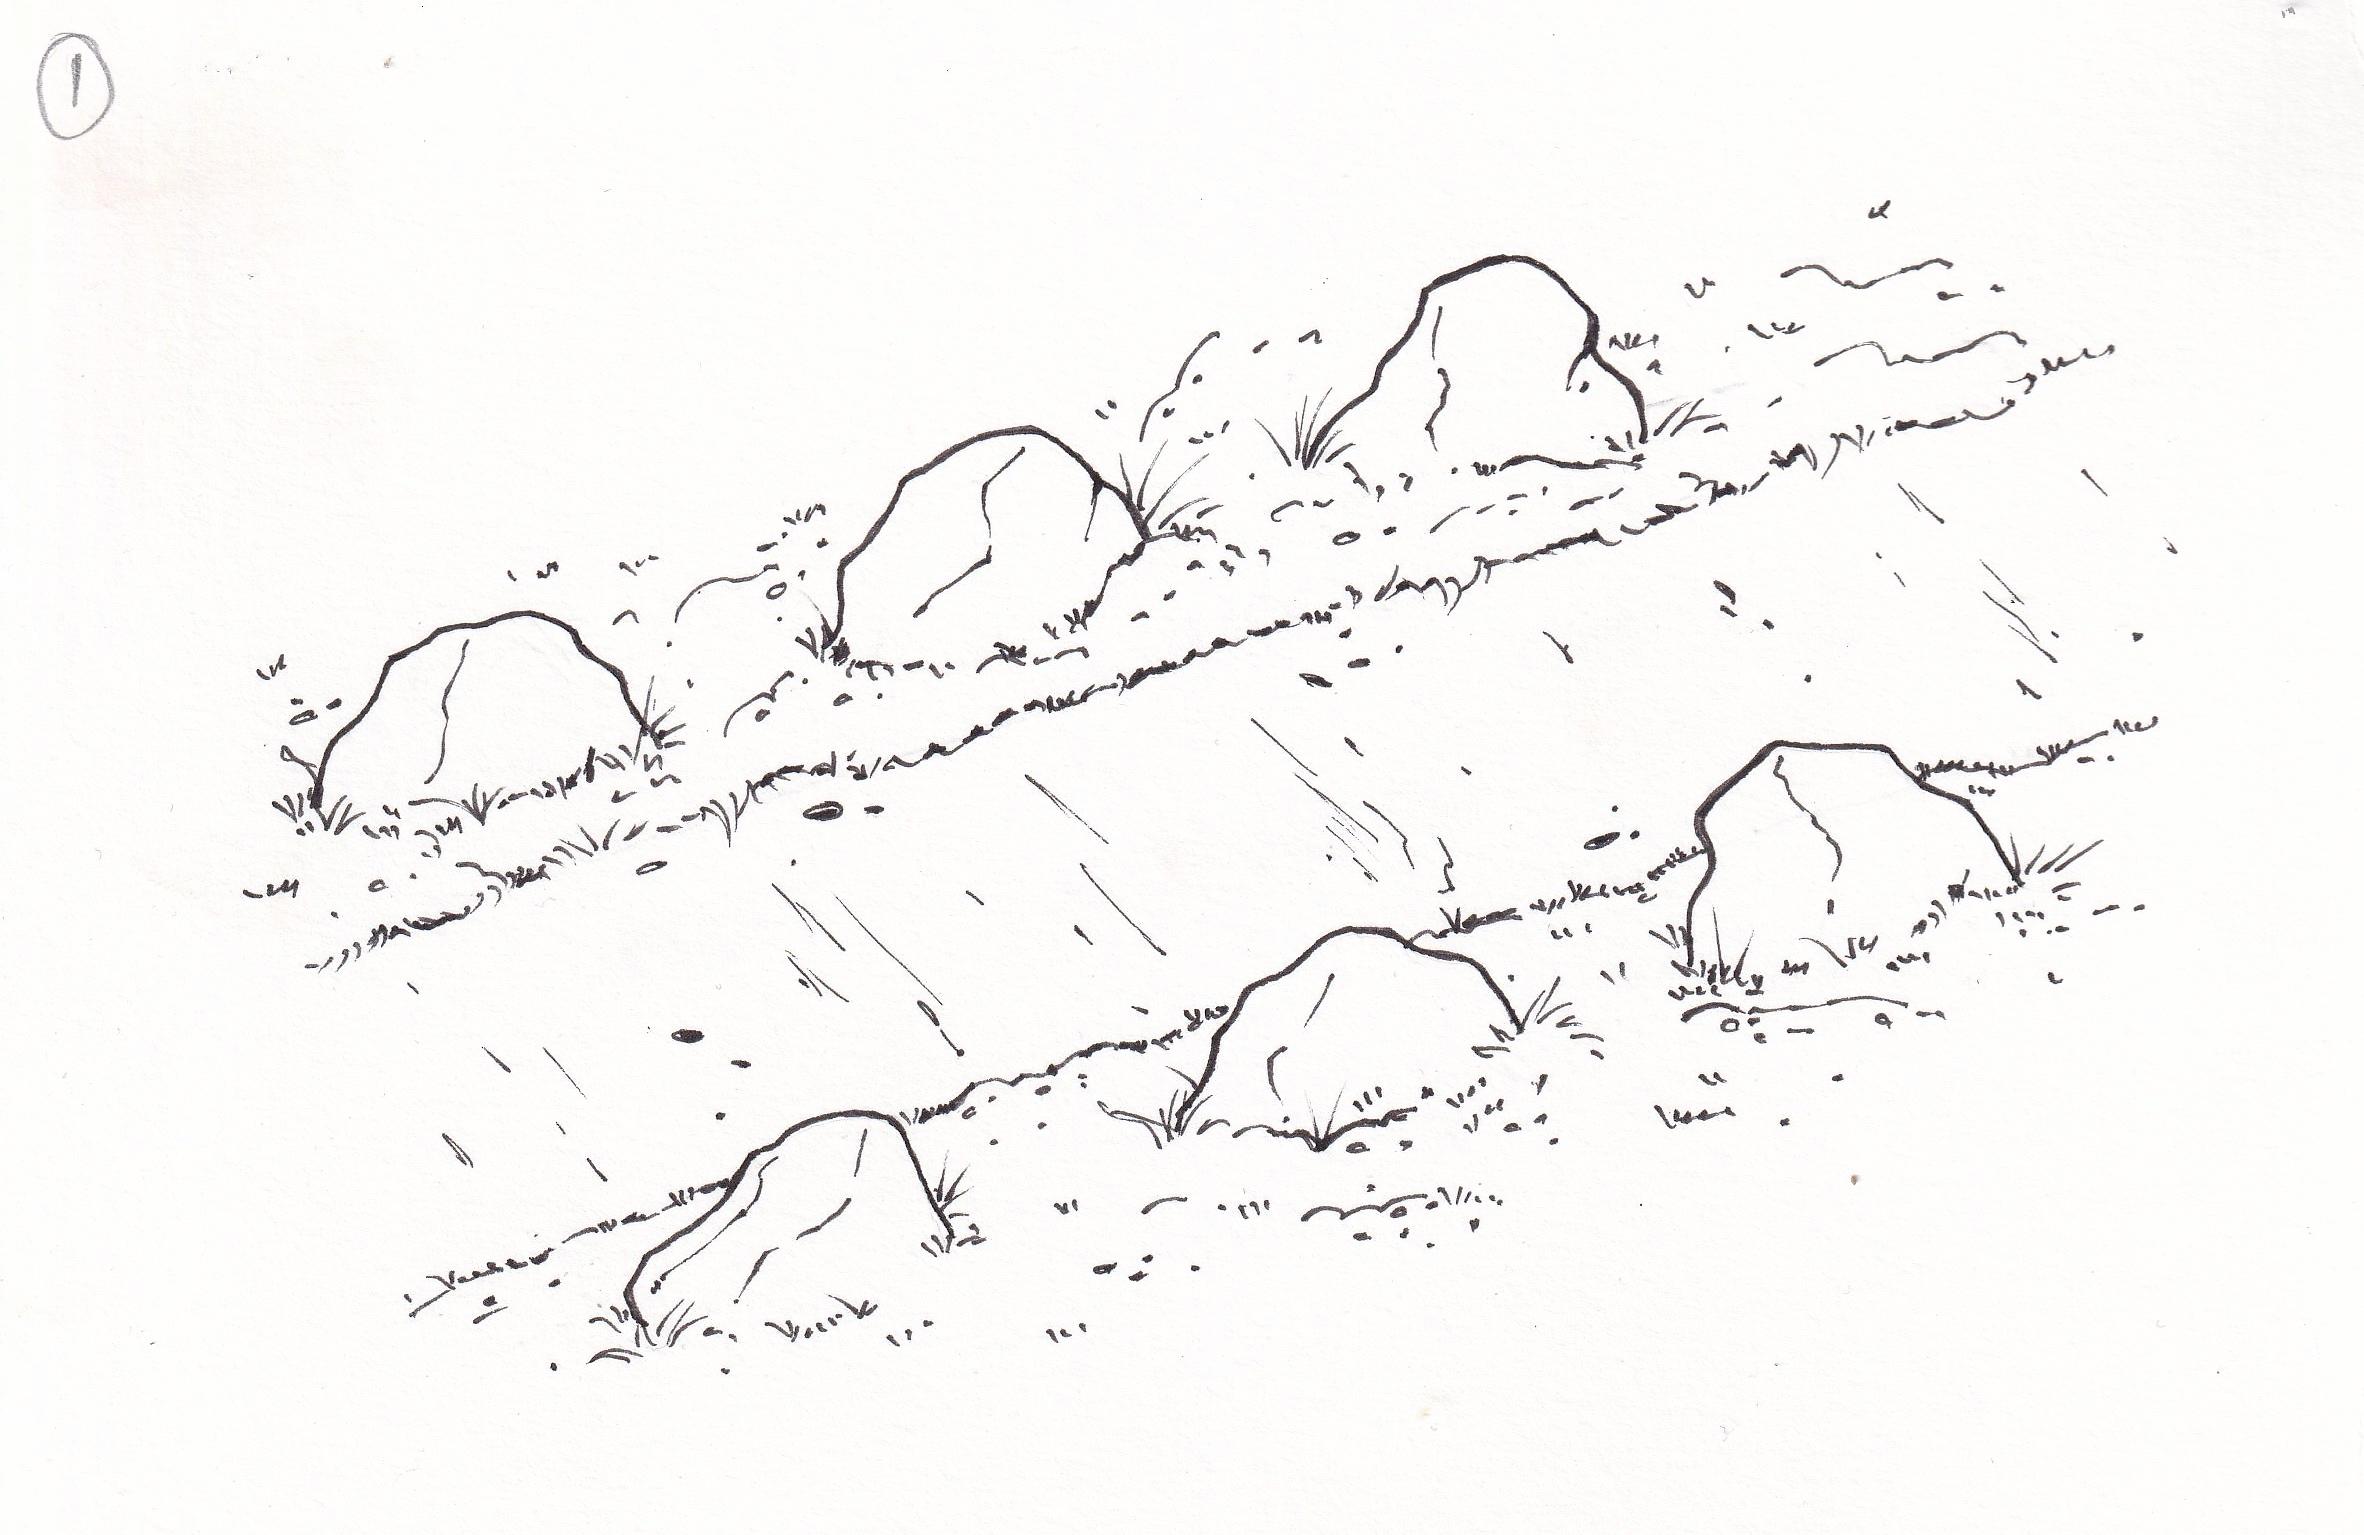 Uppröðun steina of einsleit